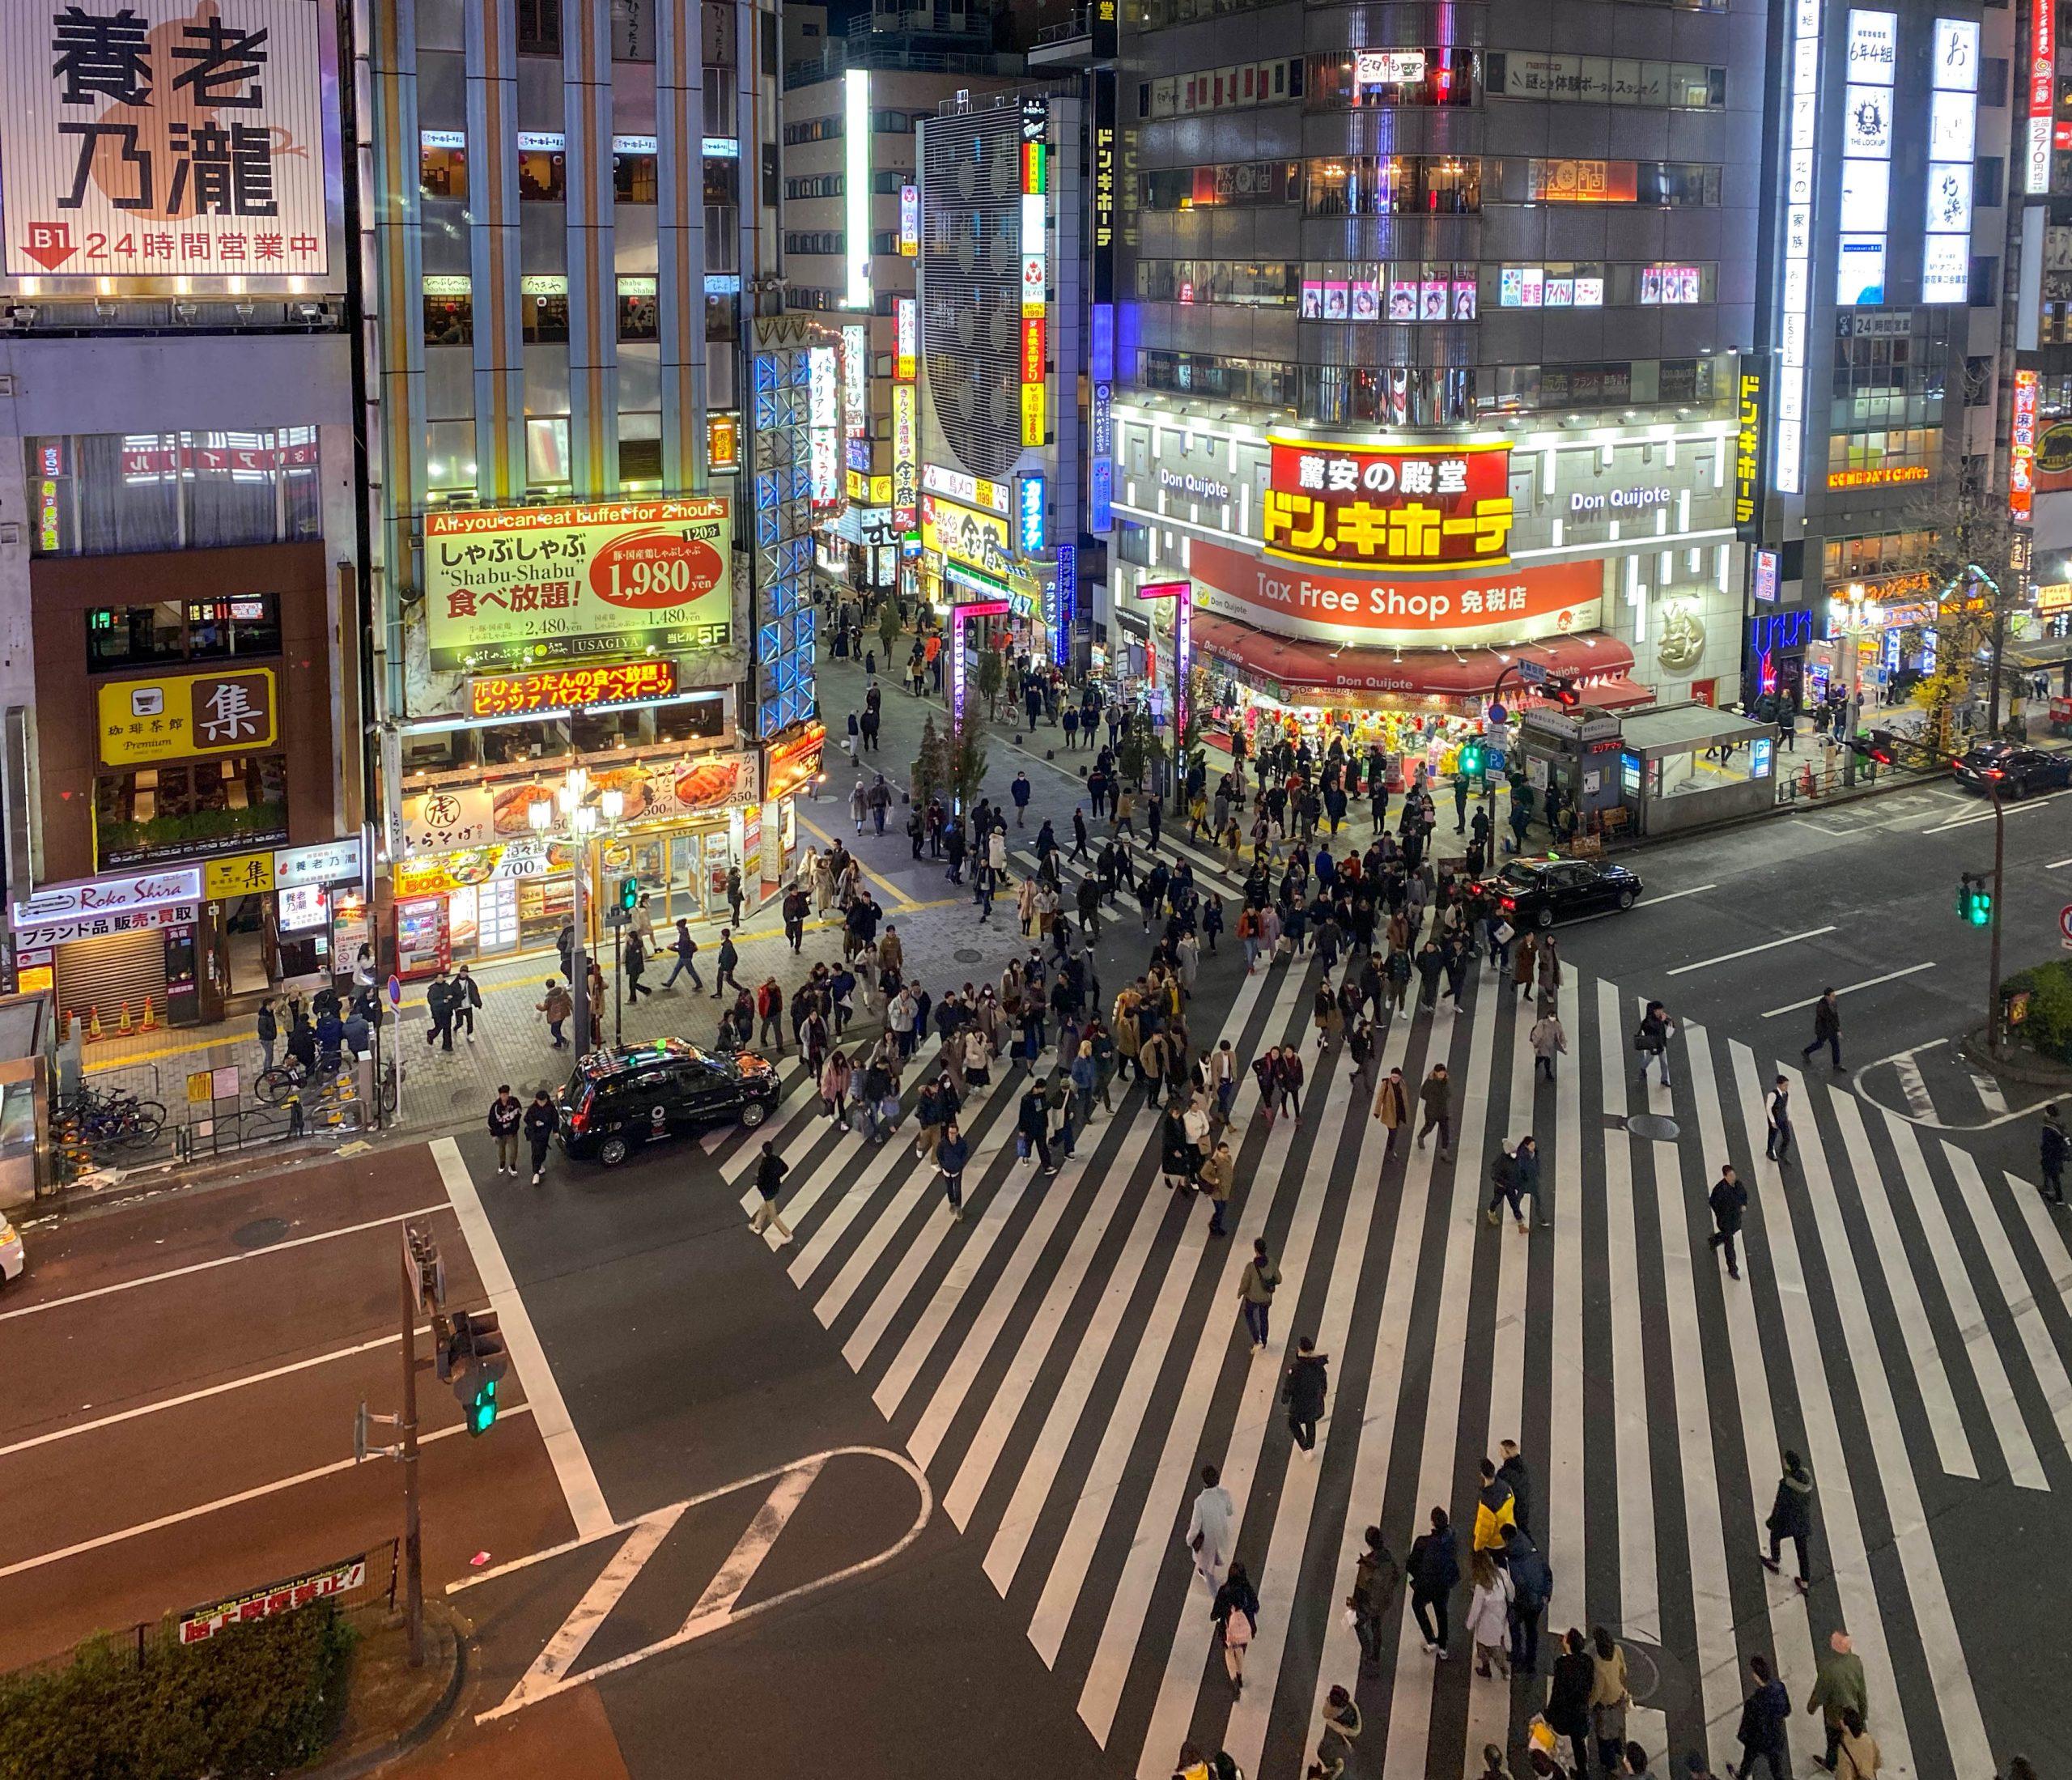 JAPAN JANUARY 2-3, 2020-15